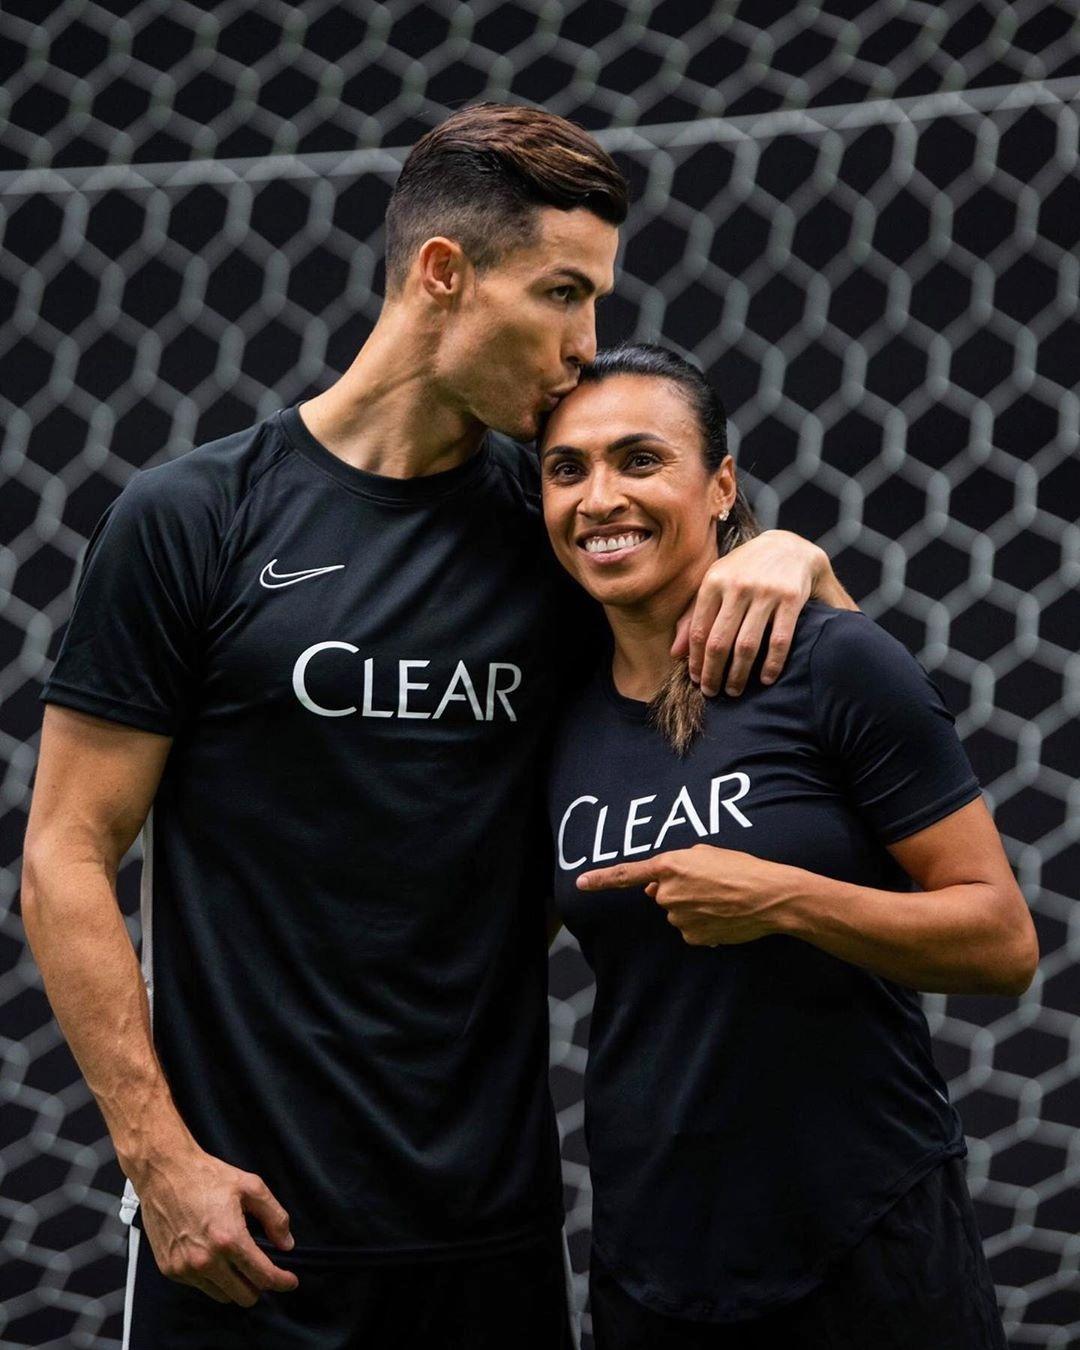 Cristiano Ronaldo e Marta Silva, gigantes do futebol mundial